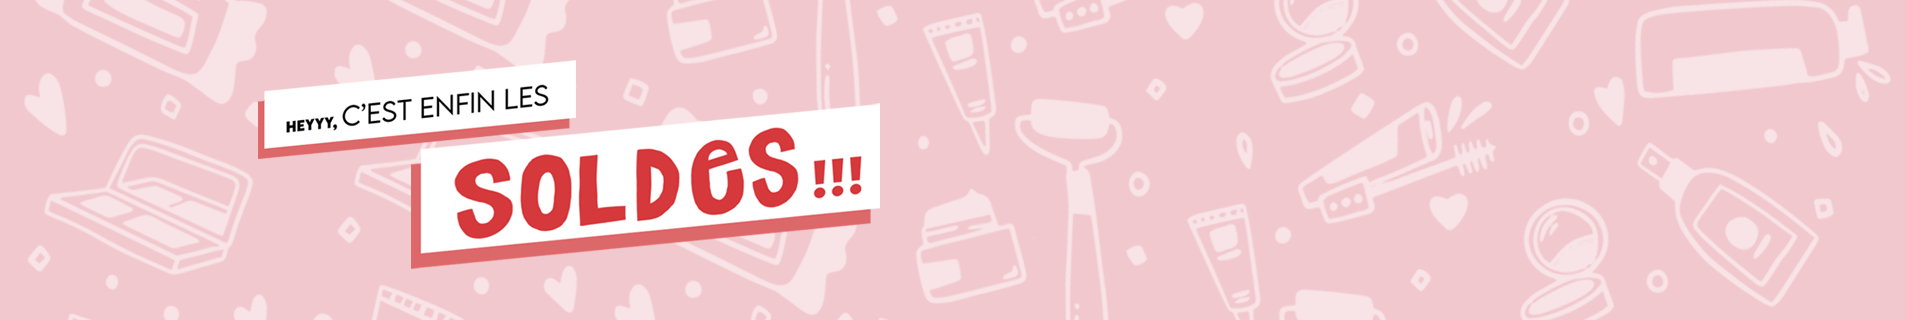 Site de maquillage de marque pas cher | SAGA Cosmetics